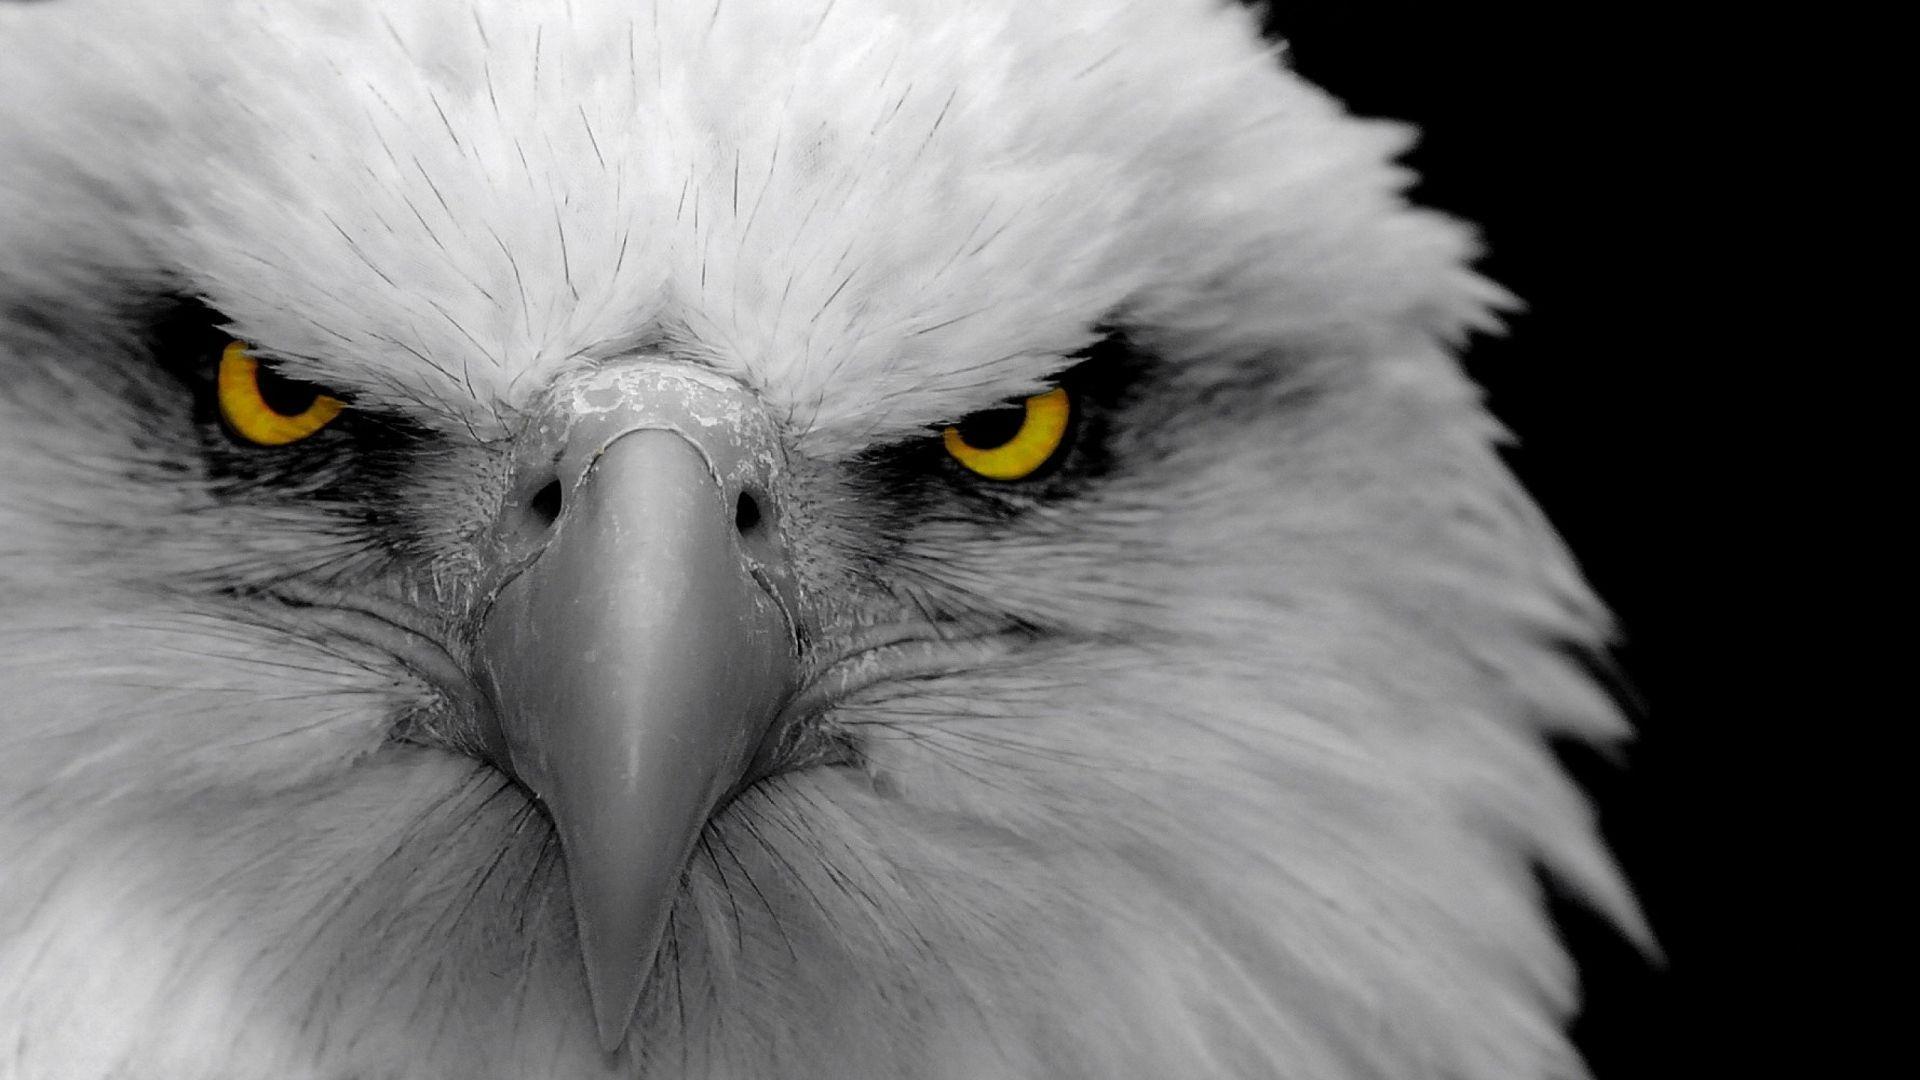 Full HD 1080p Eagle Wallpapers HD, Desktop Backgrounds 1920x1080 ...